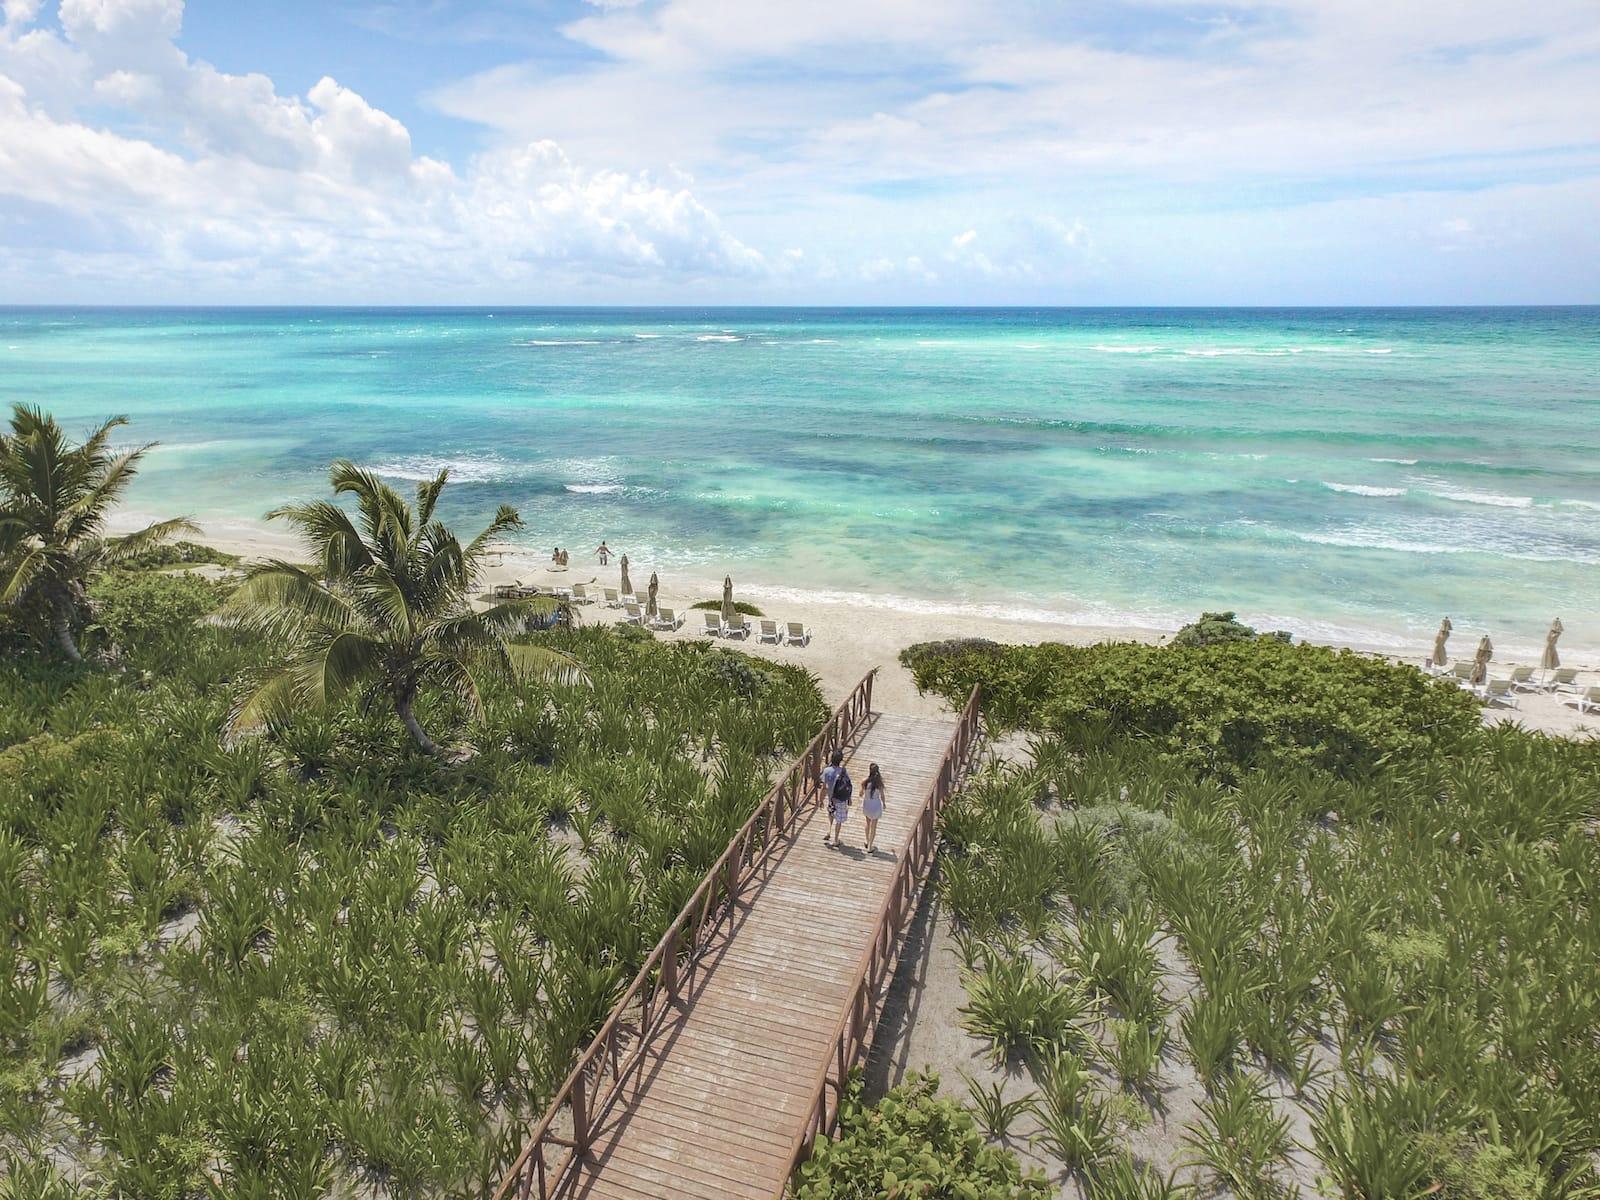 Beach walkway adventure all inclusive resort mexico romantic vacation